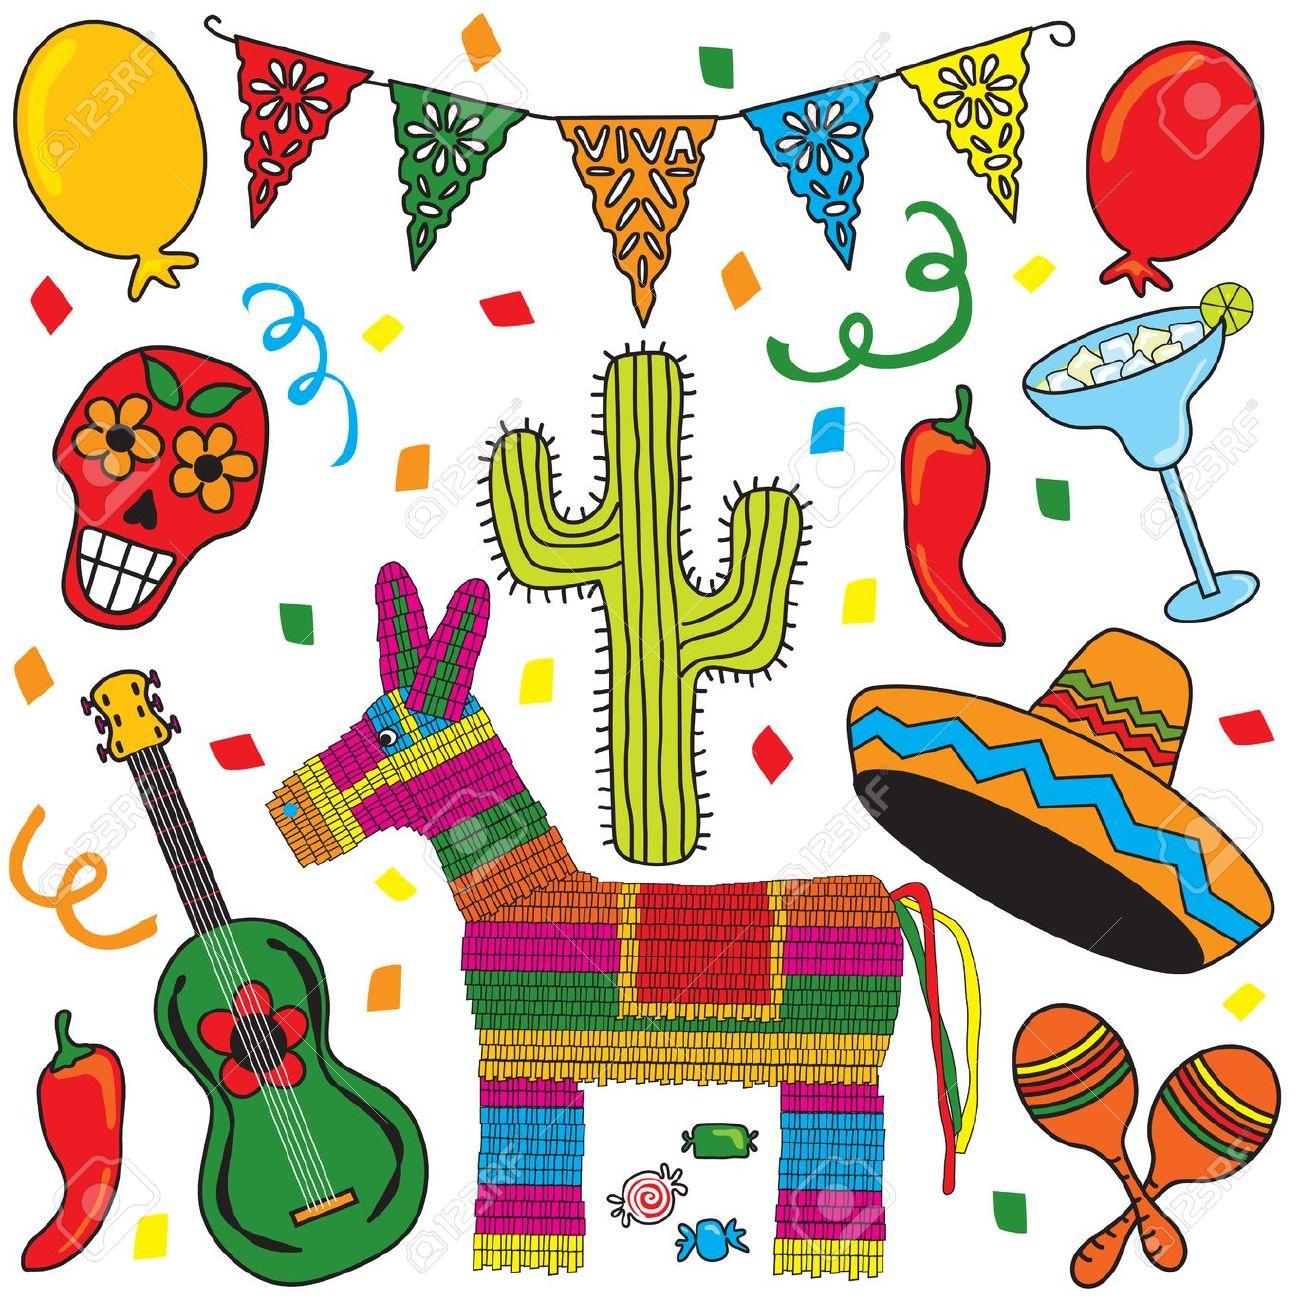 Free Fiesta Mariachi Cliparts, Download Free Clip Art, Free.